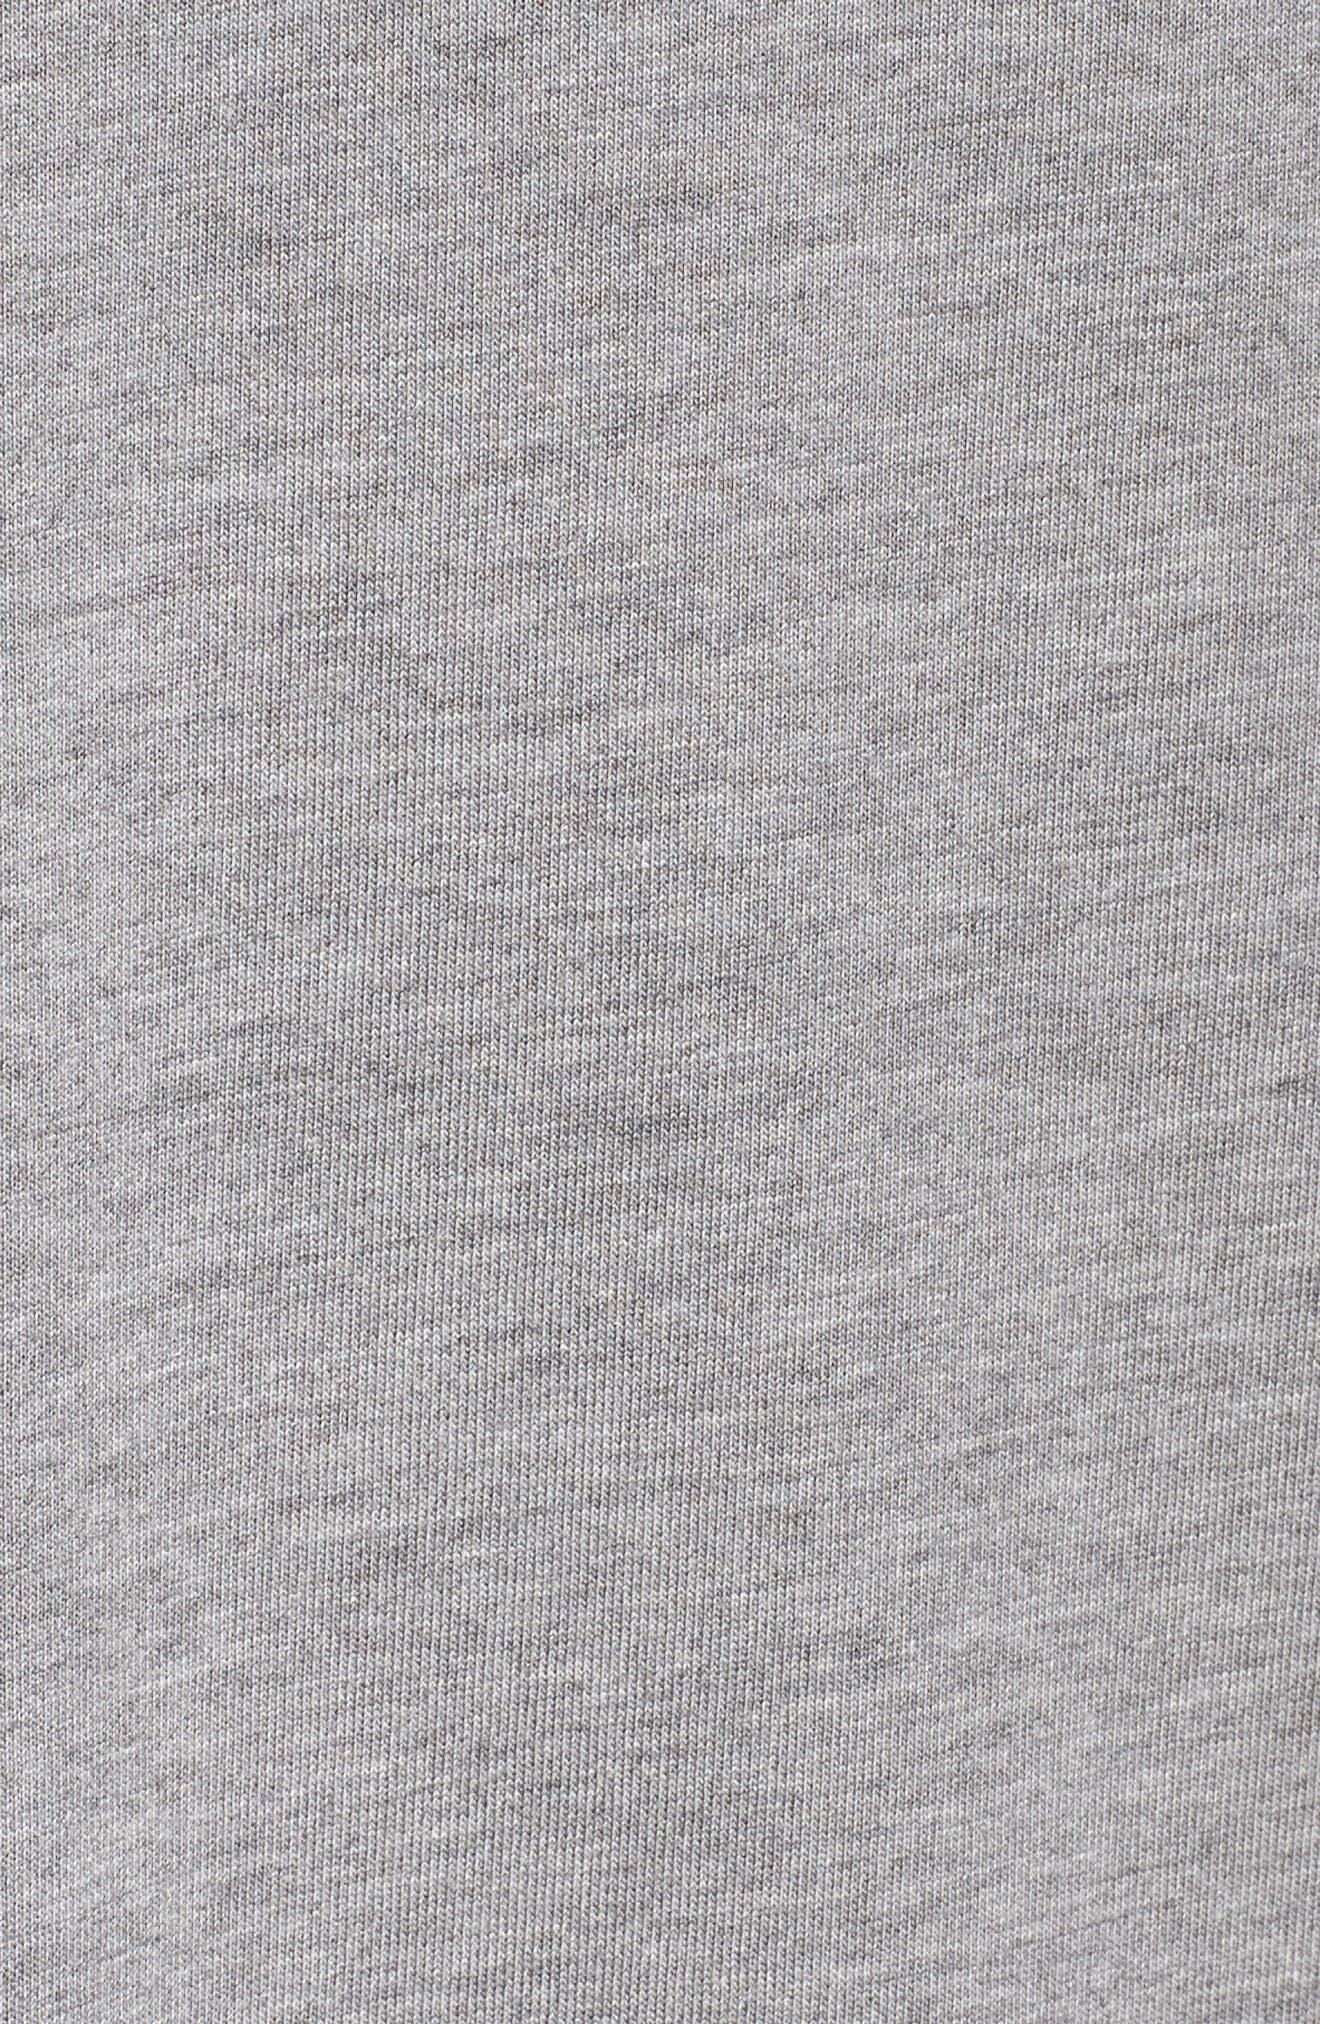 Sportswear Sleeveless Dress,                             Alternate thumbnail 6, color,                             Carbon Heather/ Crimson Pulse